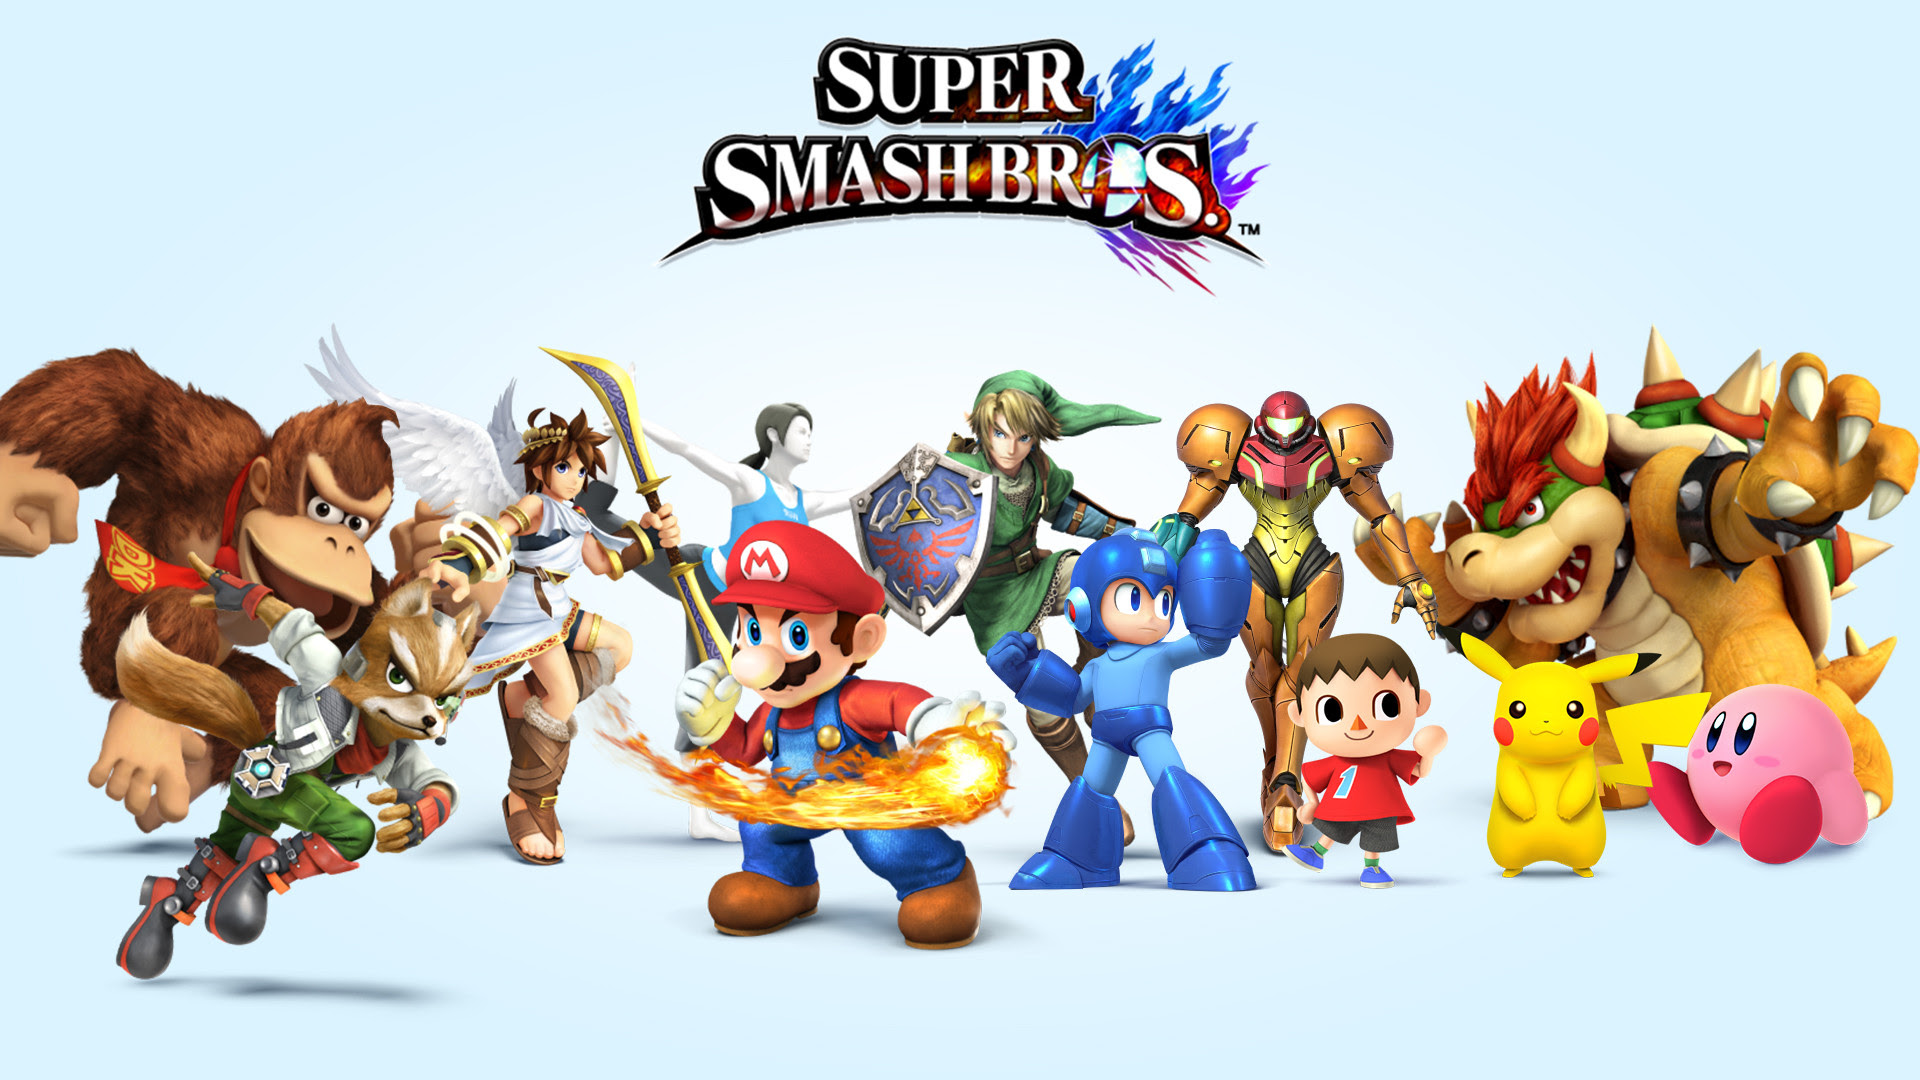 Super Smash Bros 4 Characters Wallpaper Hd Volume 1 Smashbros